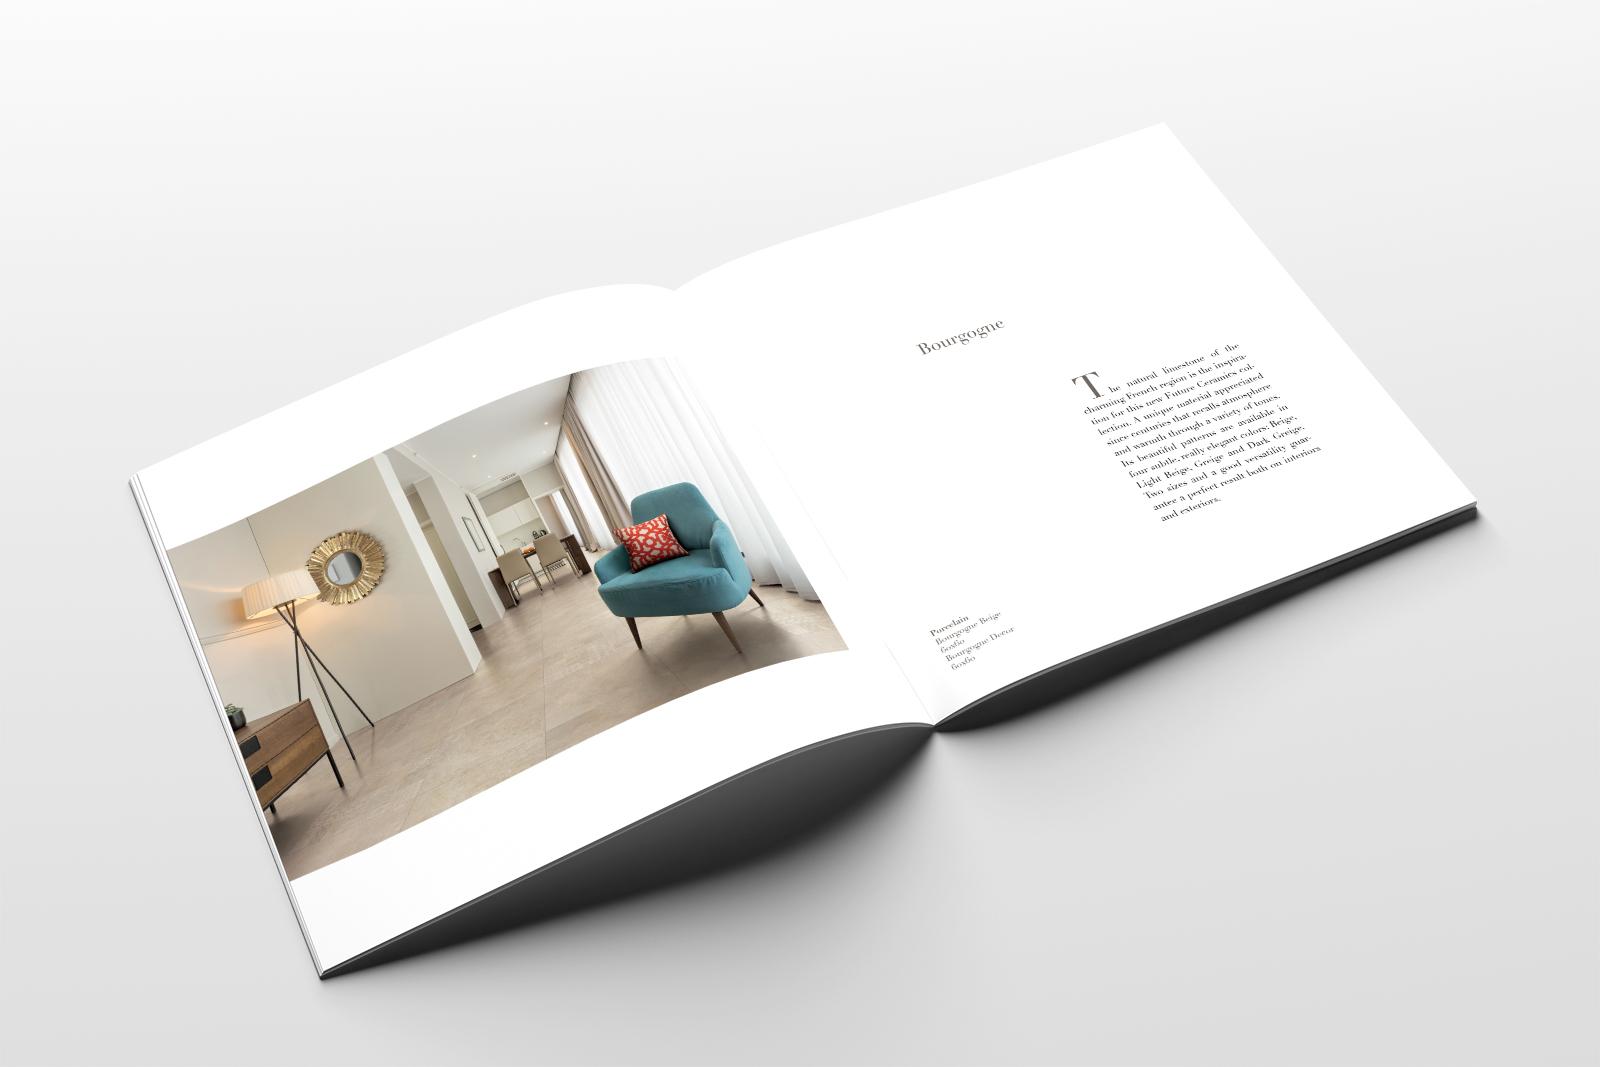 fc-catalogo-borgogna-02